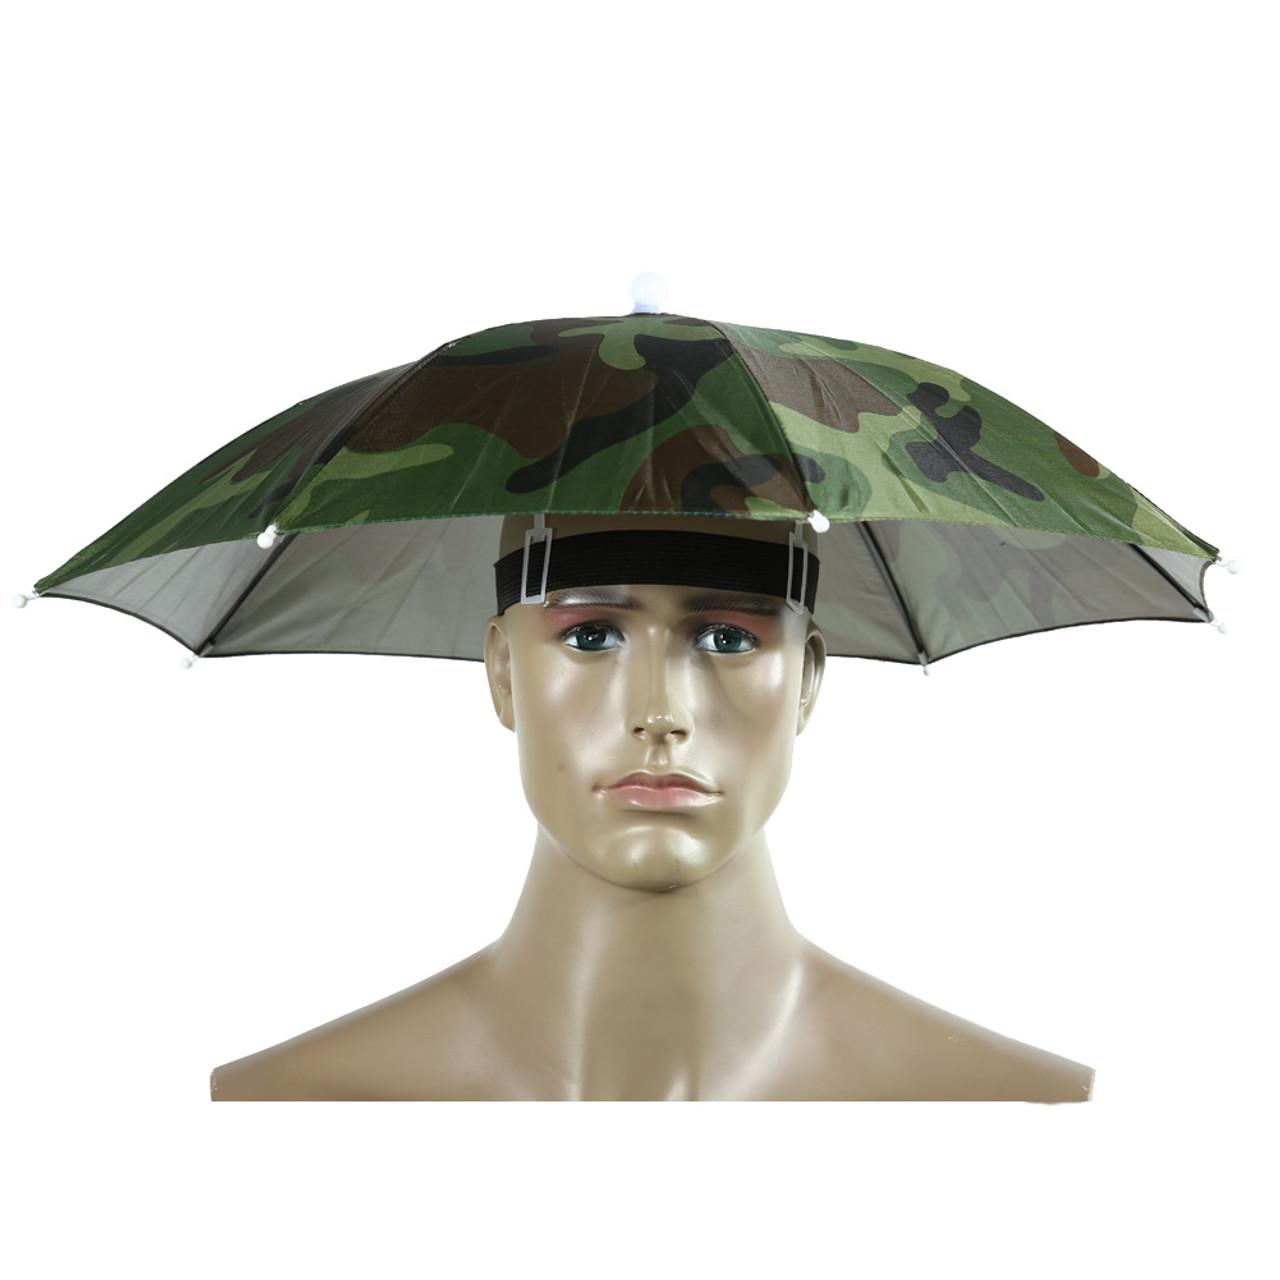 6a726e86 ... 2 Color Umbrella Hat Parapluie Sun Umbrella Sun Shade Camping Hiking  Fishing Umbrella Festivals Outdoor Brolly ...